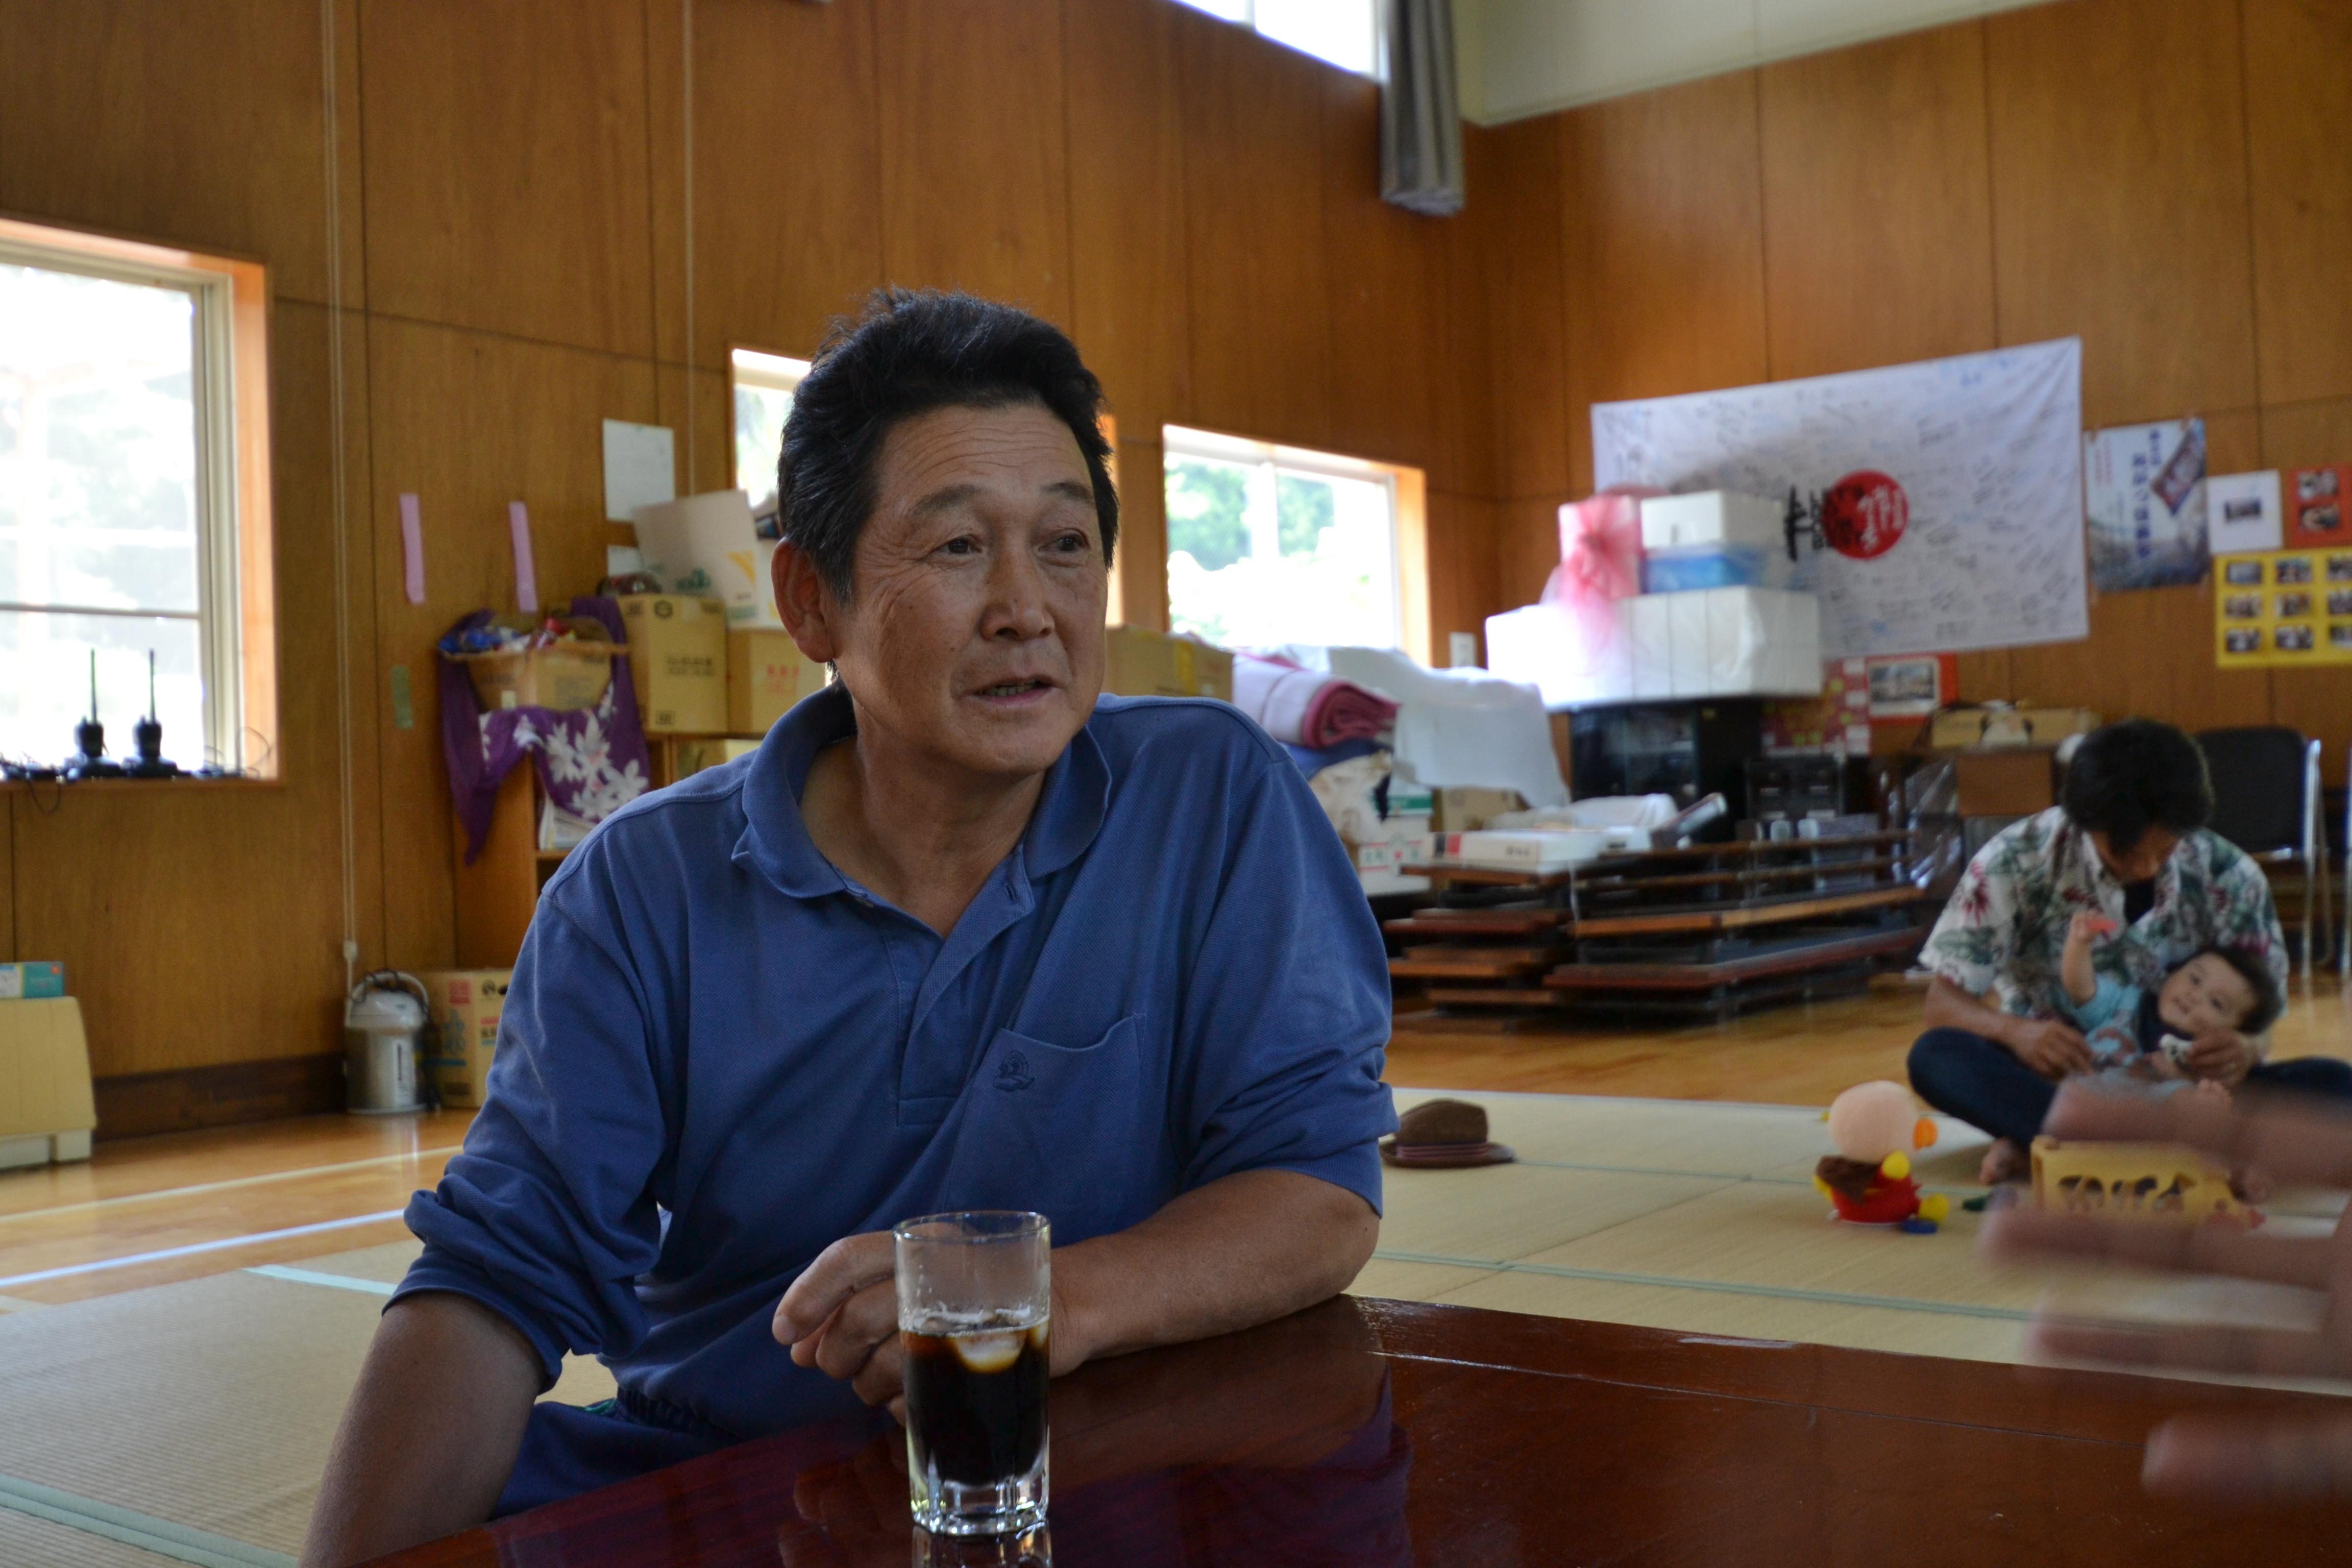 naburi yamato fisherman in temp emerg shelter meeting 2011.JPG